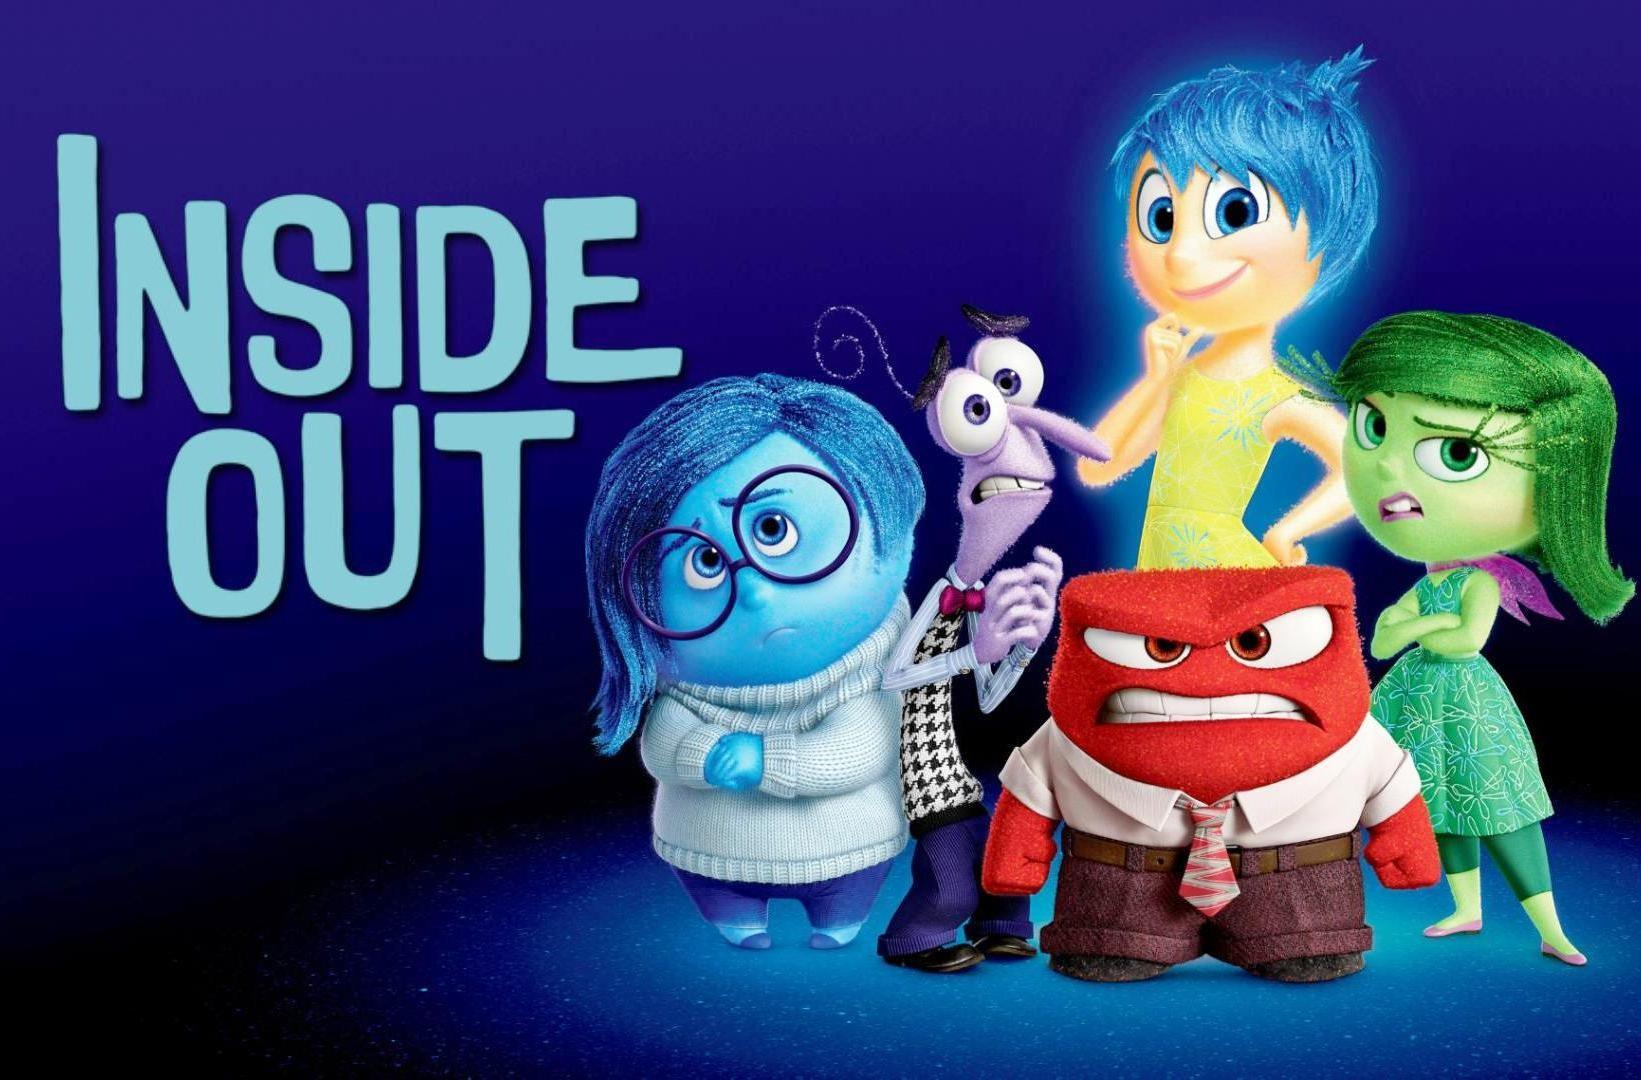 أفلام كرتون عائلية - فيلم inside out